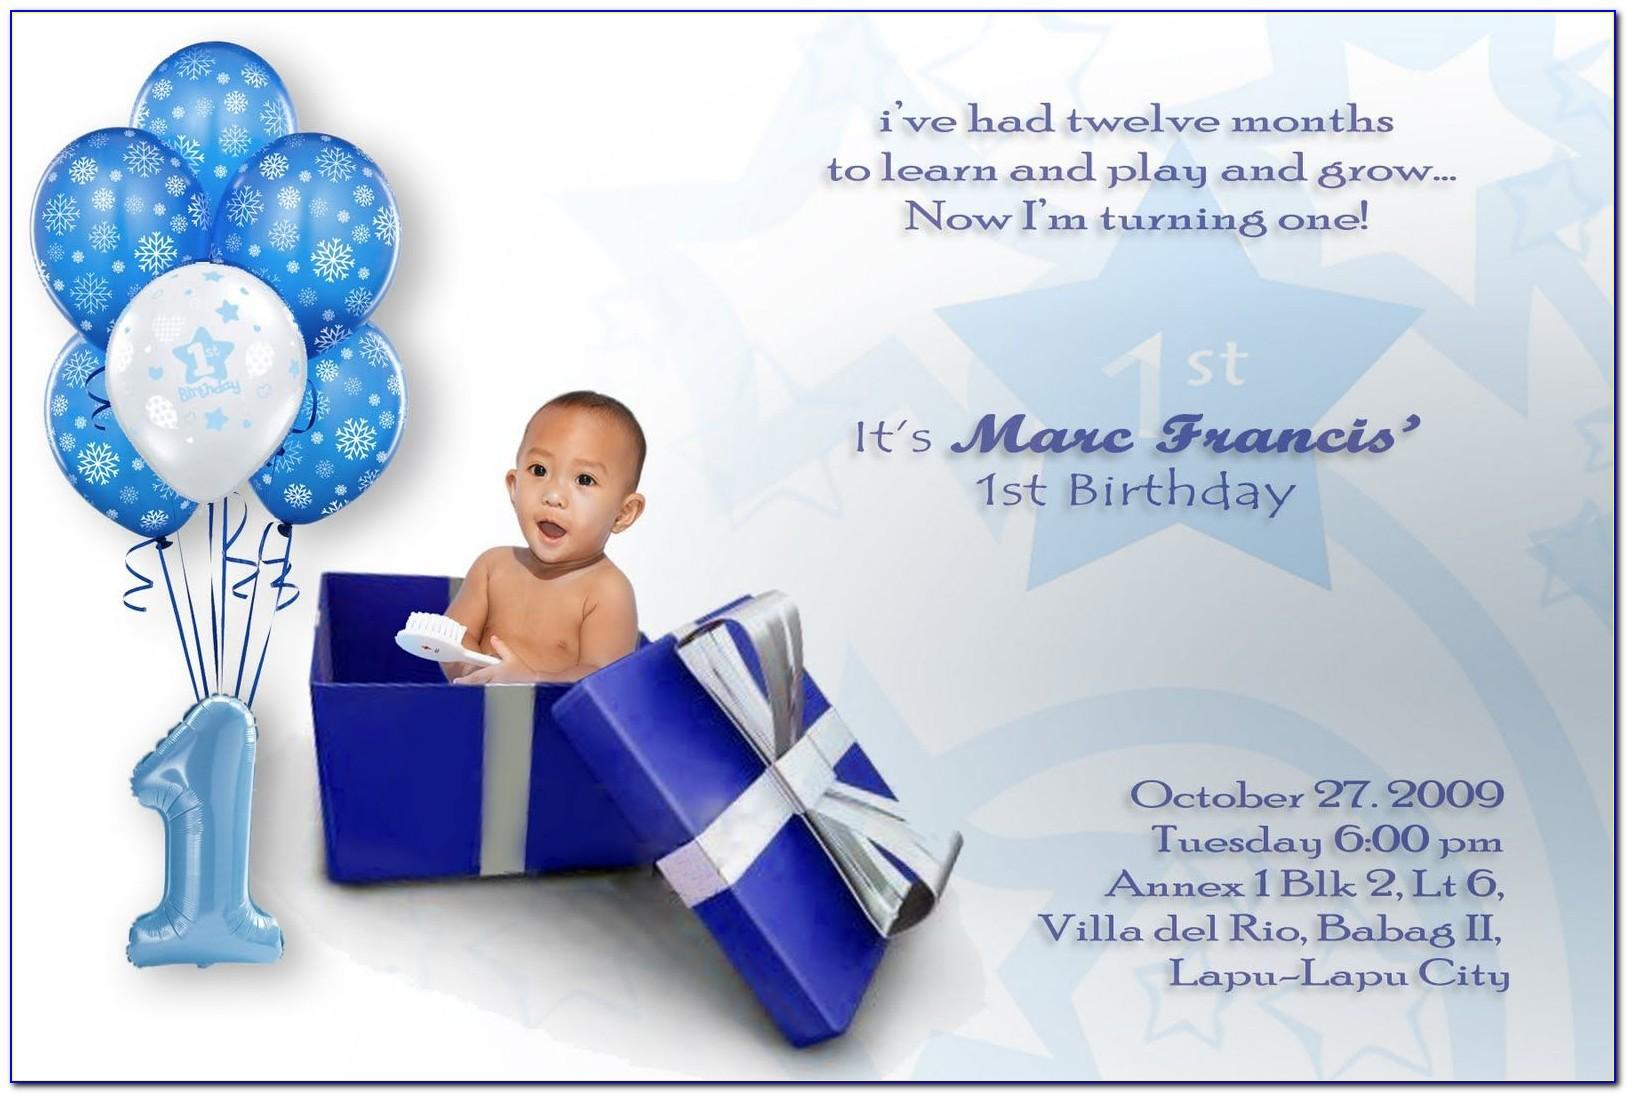 1st Birthday Invitation Card For Boy